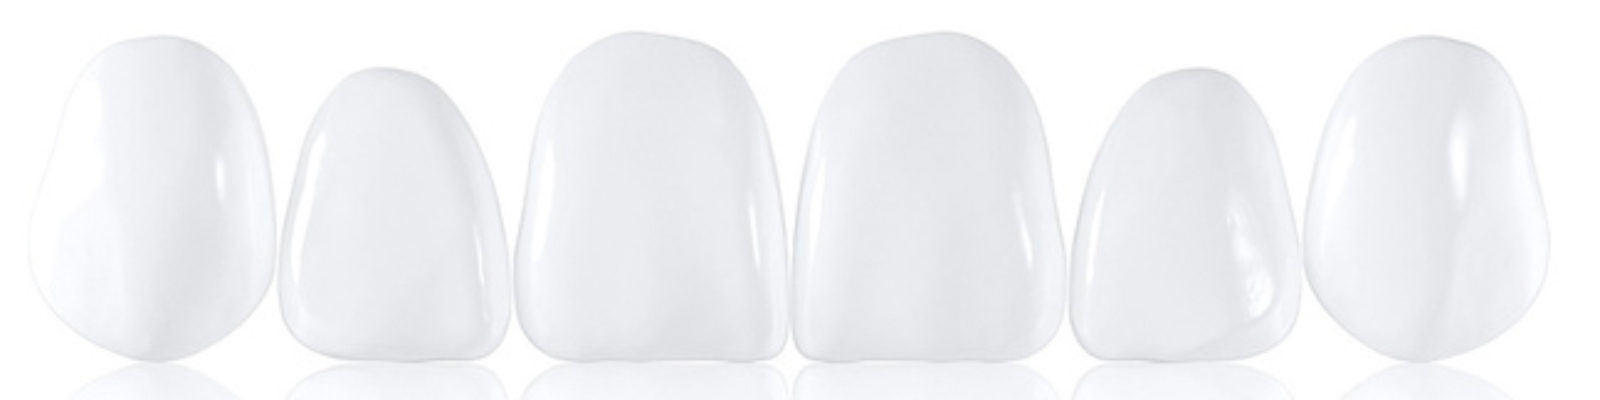 7 Common Problems in Cosmetic Dentistry (Porcelain Veneers)